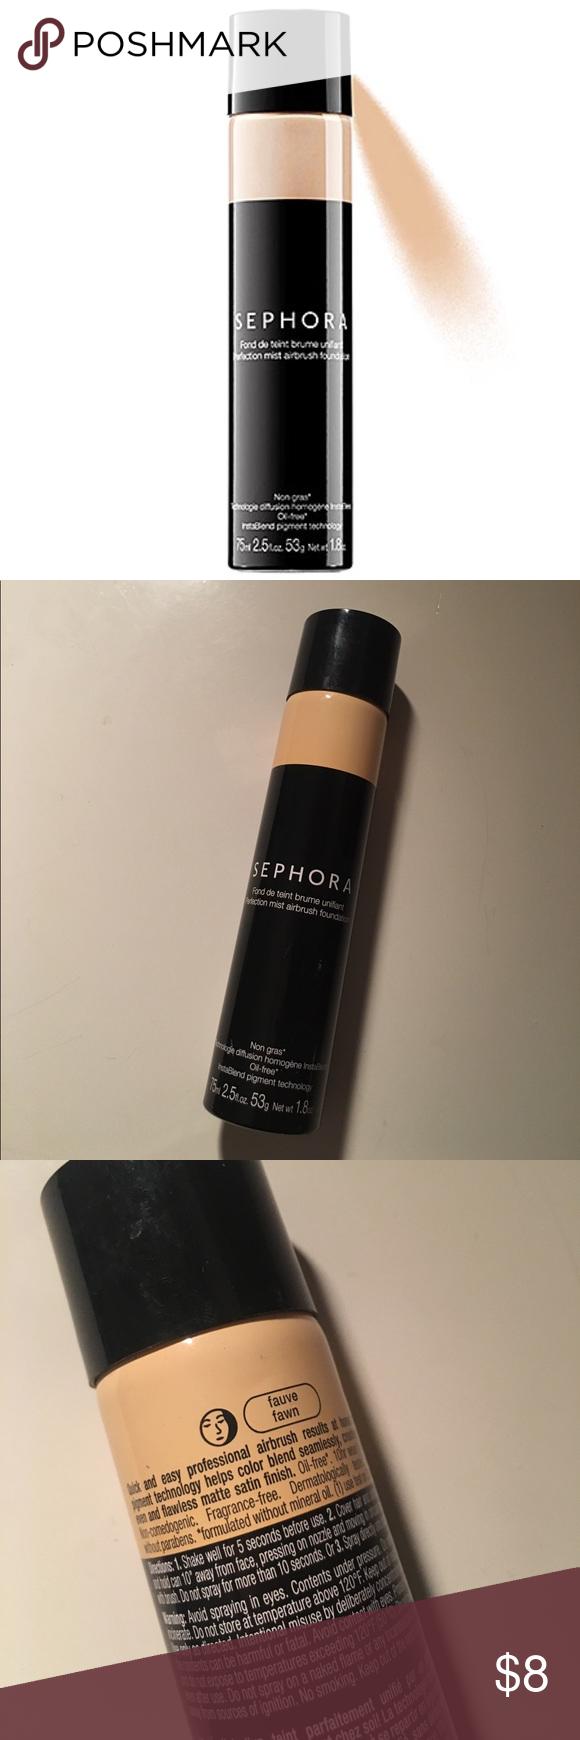 SALE!!💜 Sephora Perfect Mist Airbrush Foundation Sephora